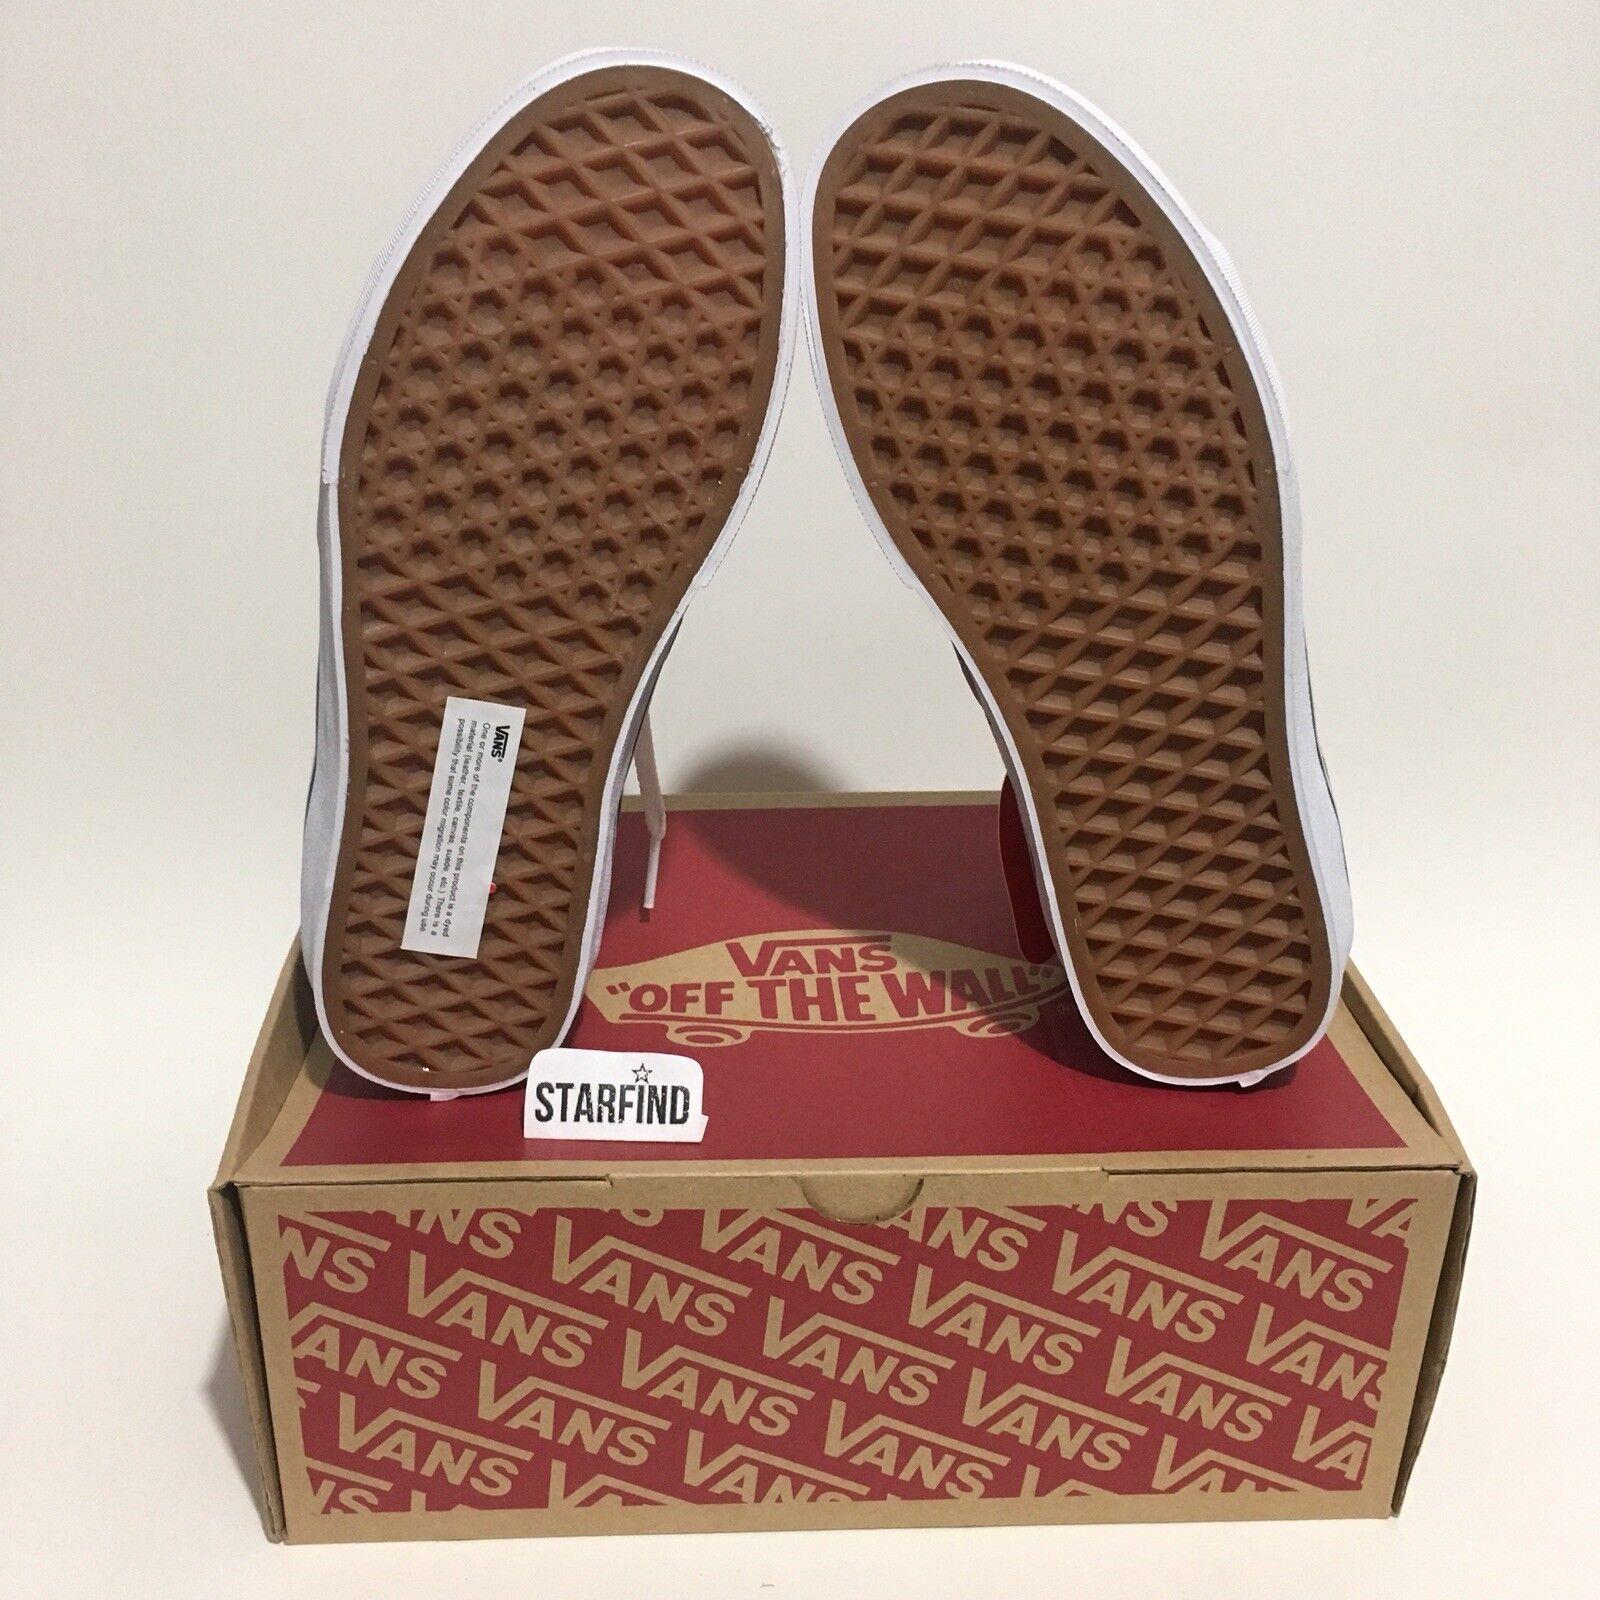 Vans Sk8-Hi pinks Sand Dollar Dollar Dollar True Mens 8   Womens 9.5 shoes Rare Box SEE... b78929